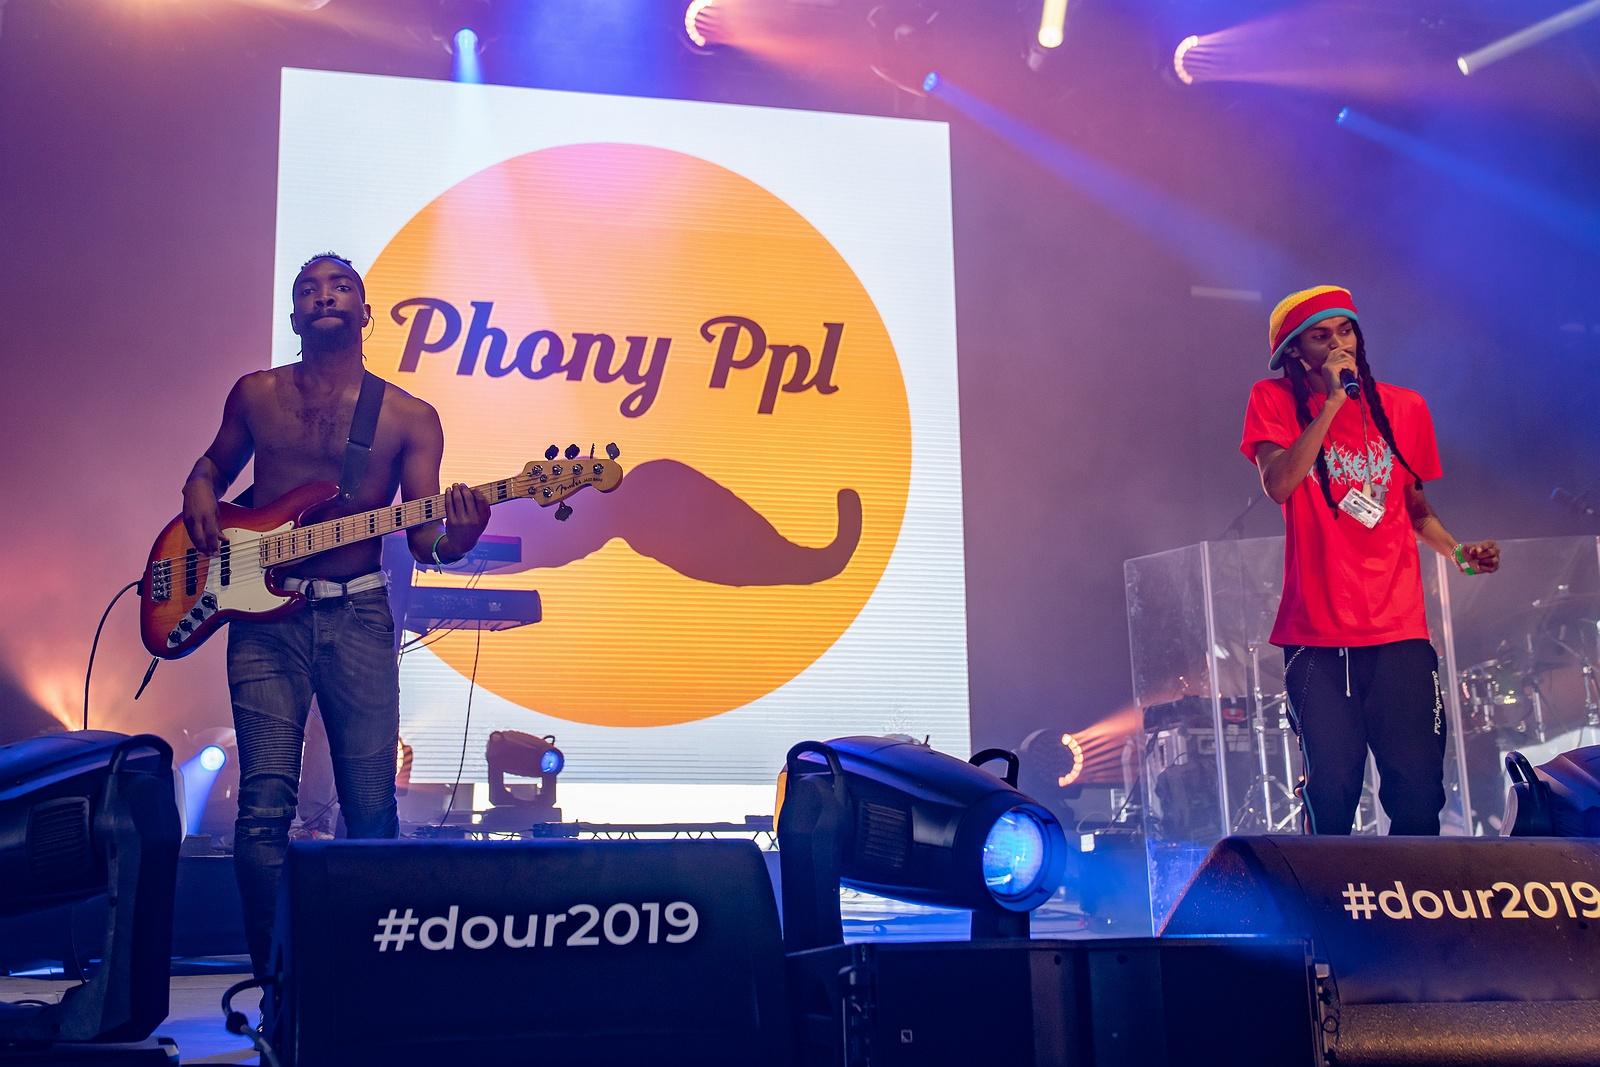 Phony Ppl 7